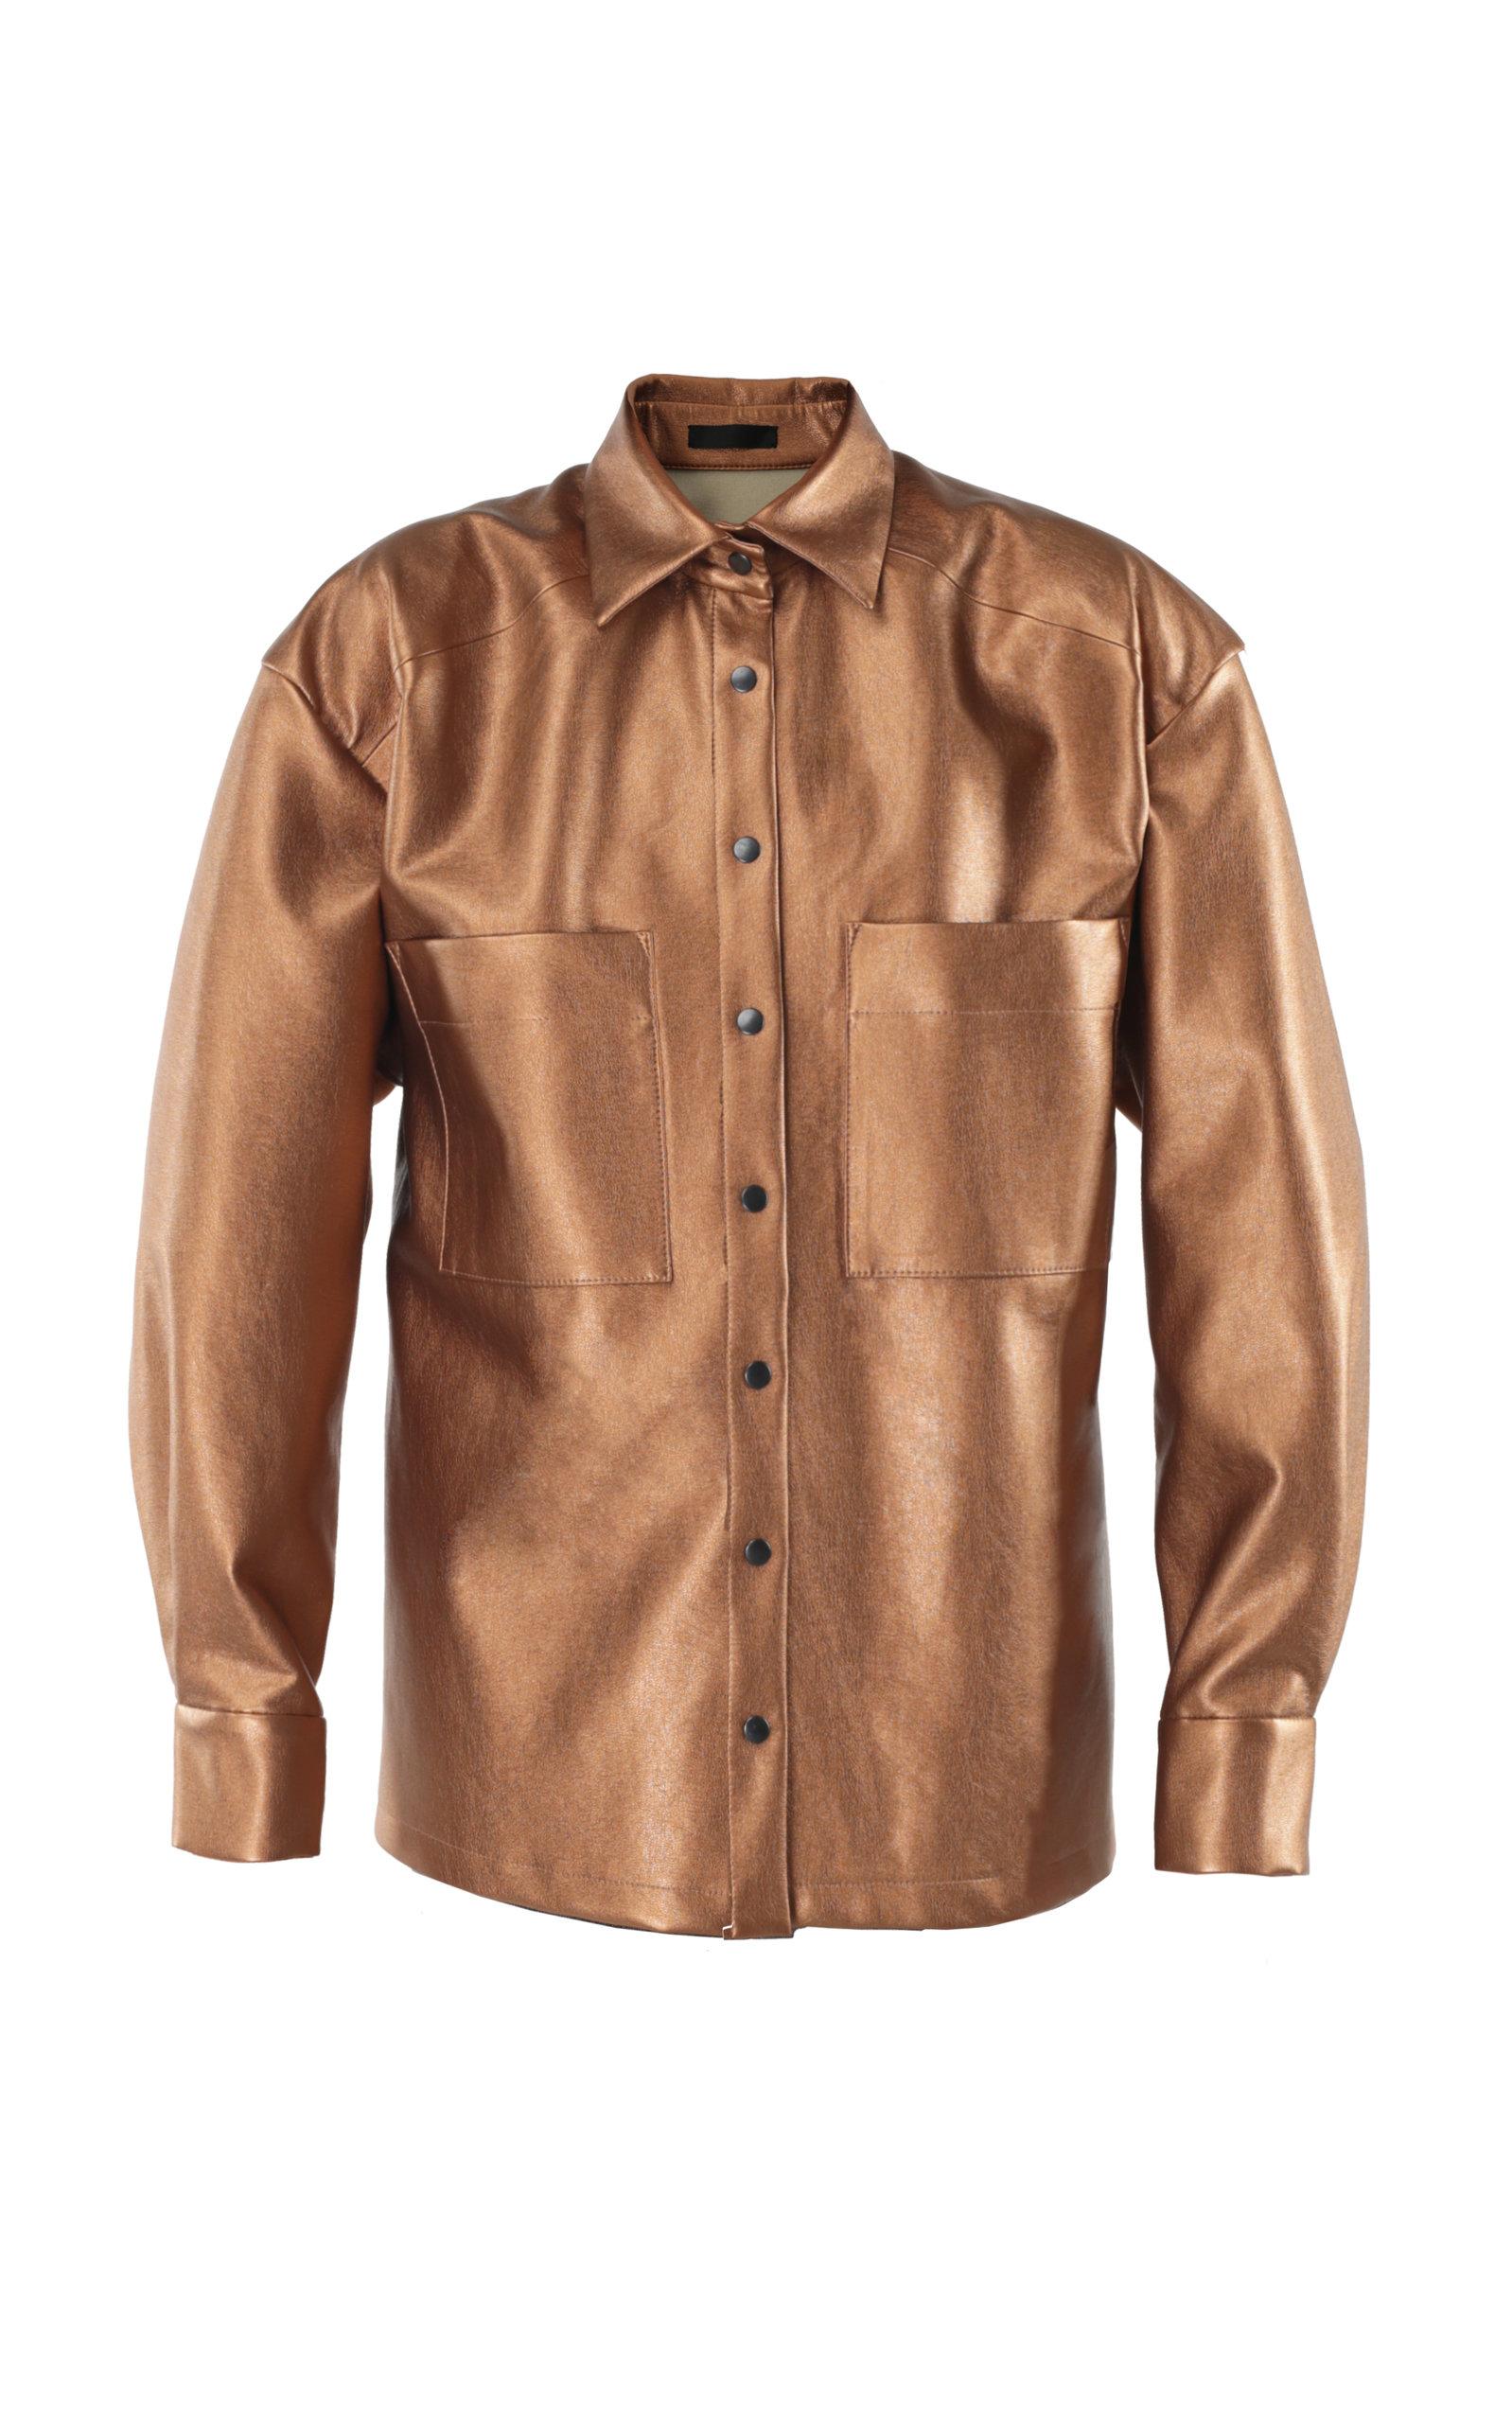 Cheap Sale 2018 New Cheap Sale Newest Button Front Shirt Lake Studio Cheap Sale Shopping Online Sale Hot Sale Buy Cheap Really c7ZMN